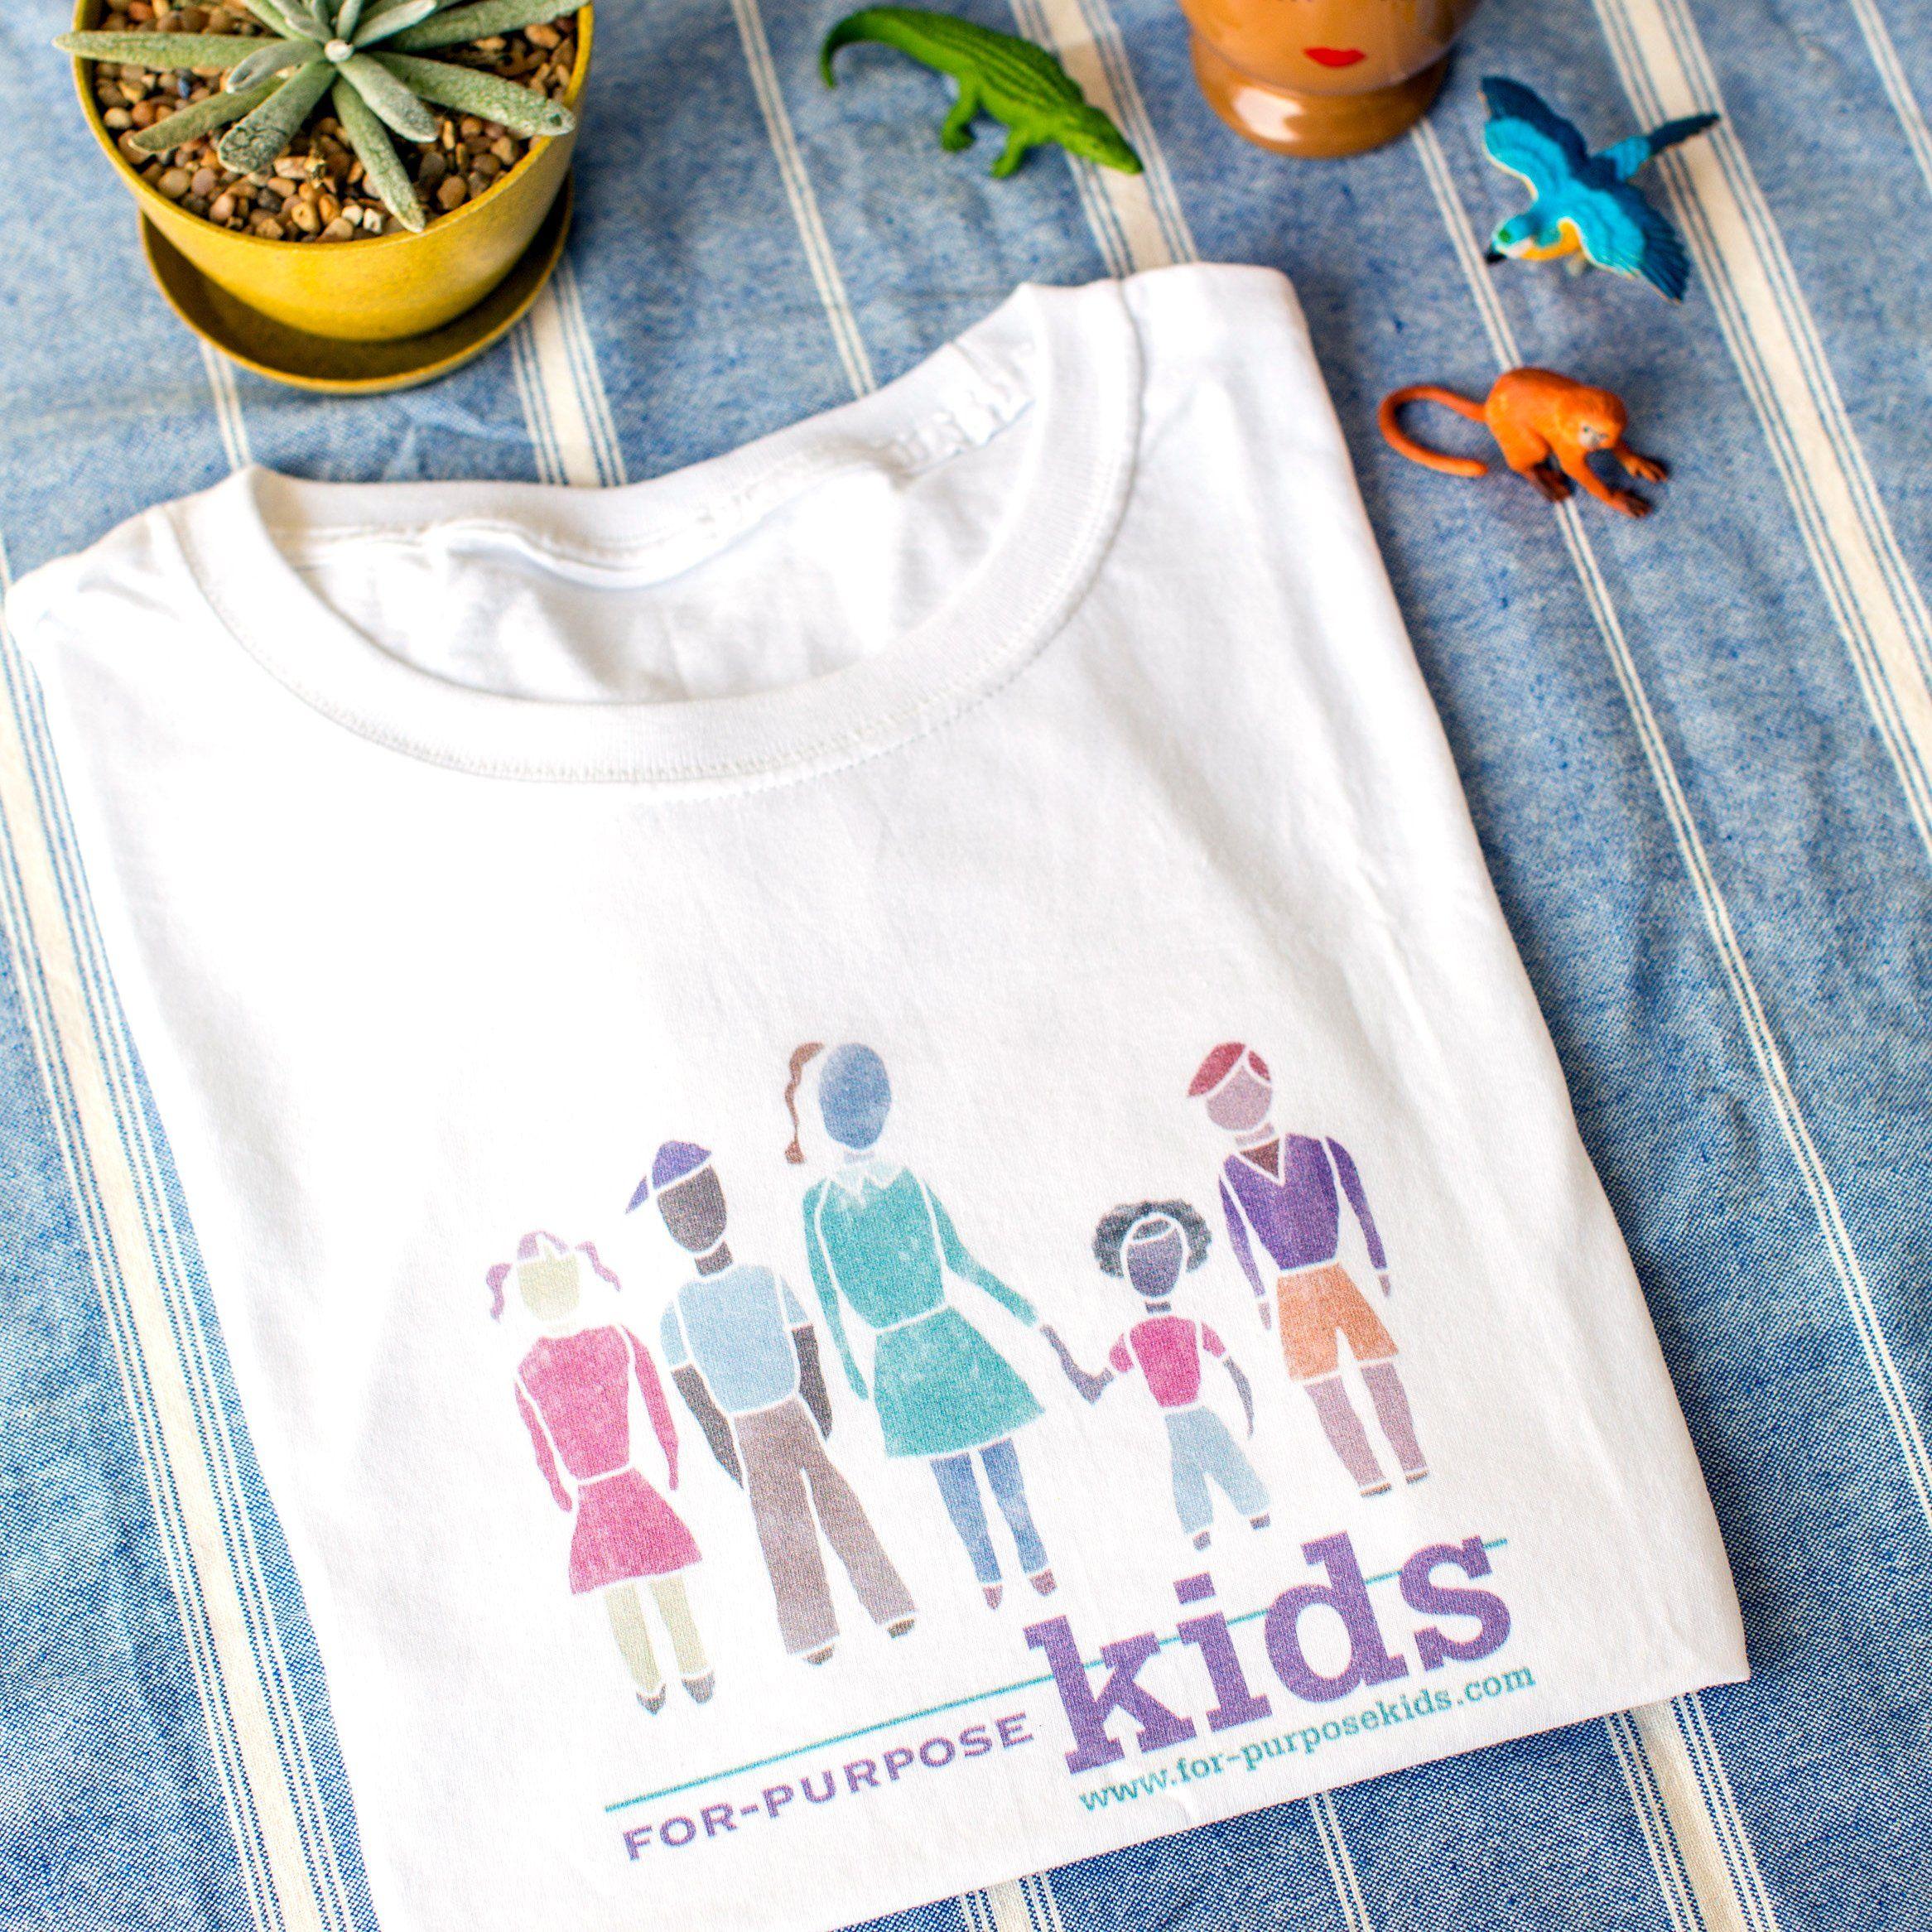 For-Purpose Kids T-shirt